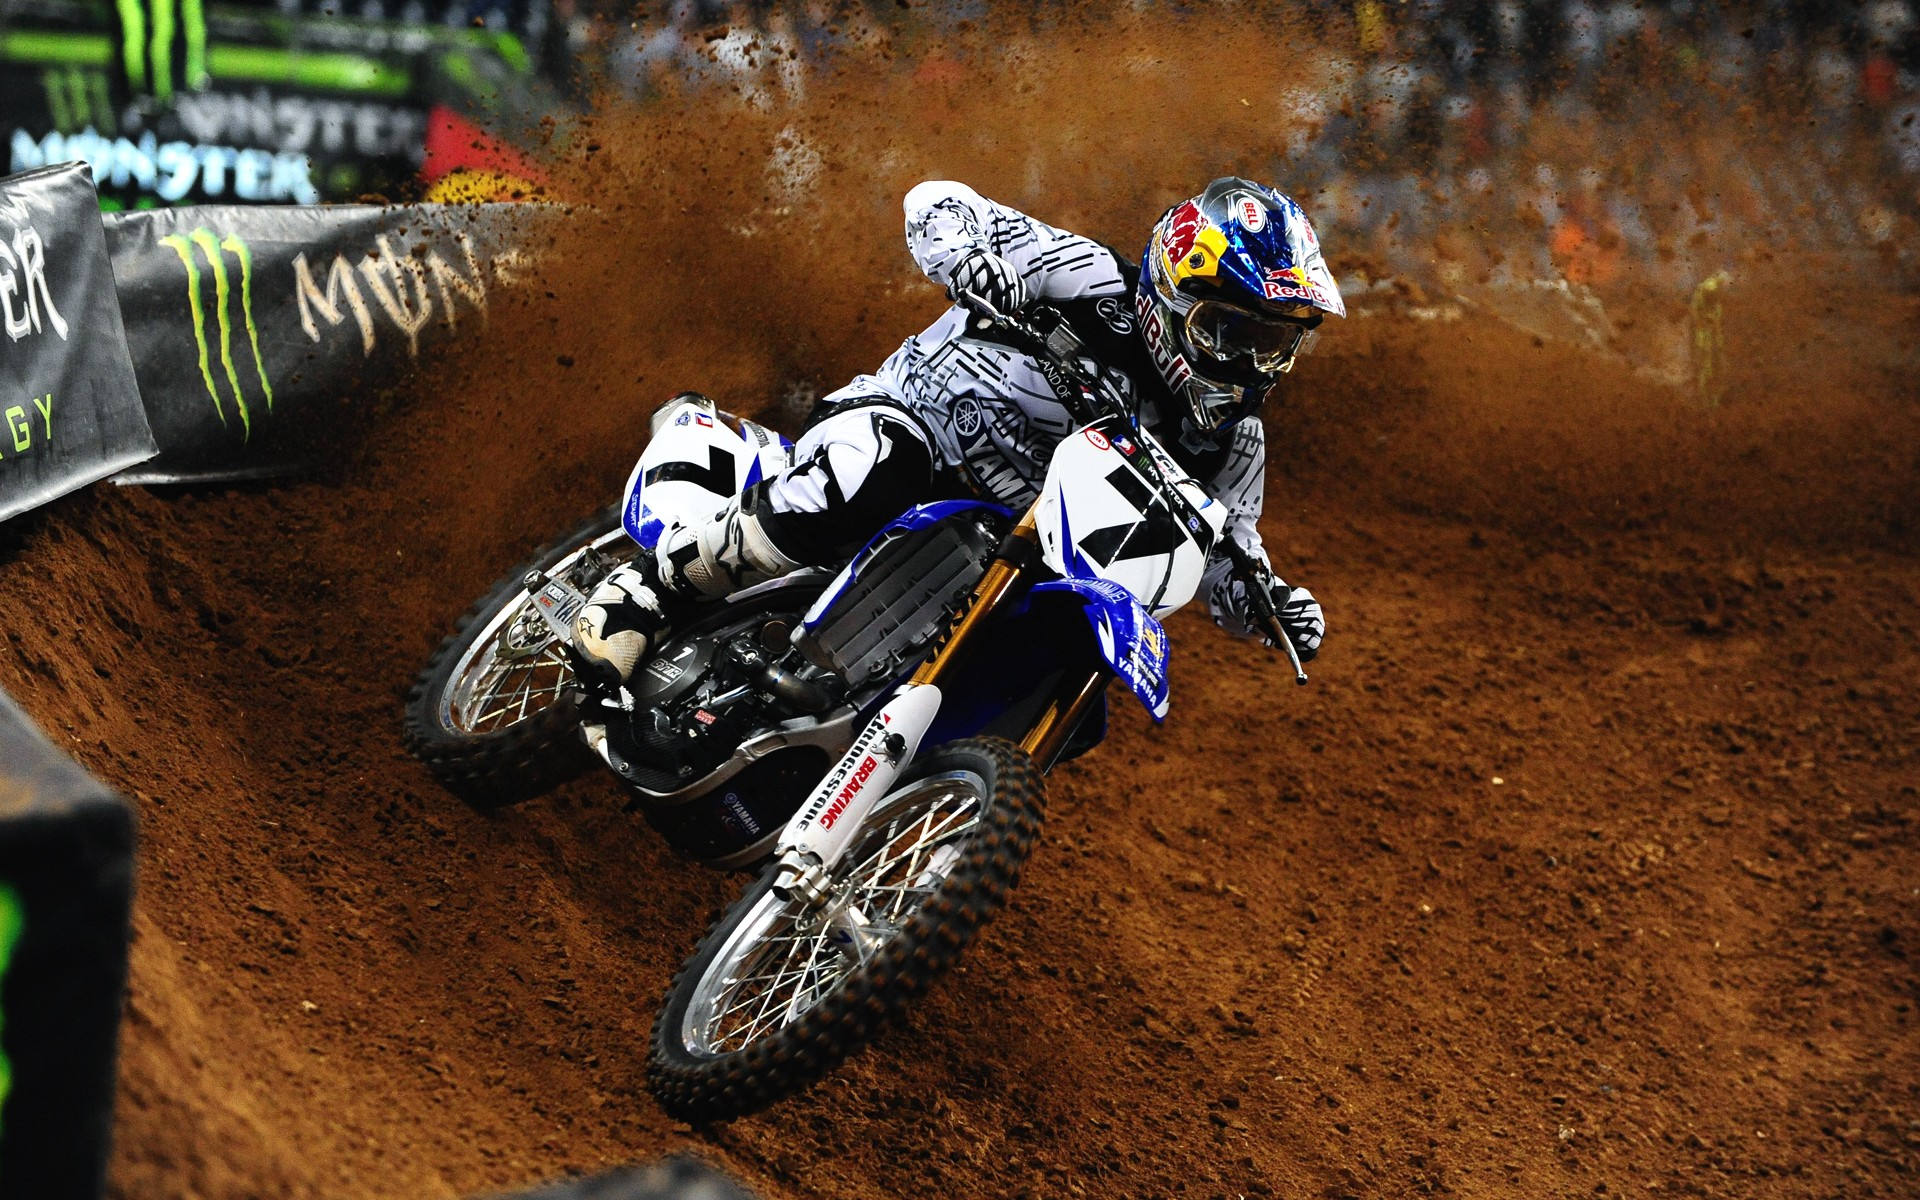 Alpha Coders Wallpaper Abyss Deporte Motocross 316267 1920x1200